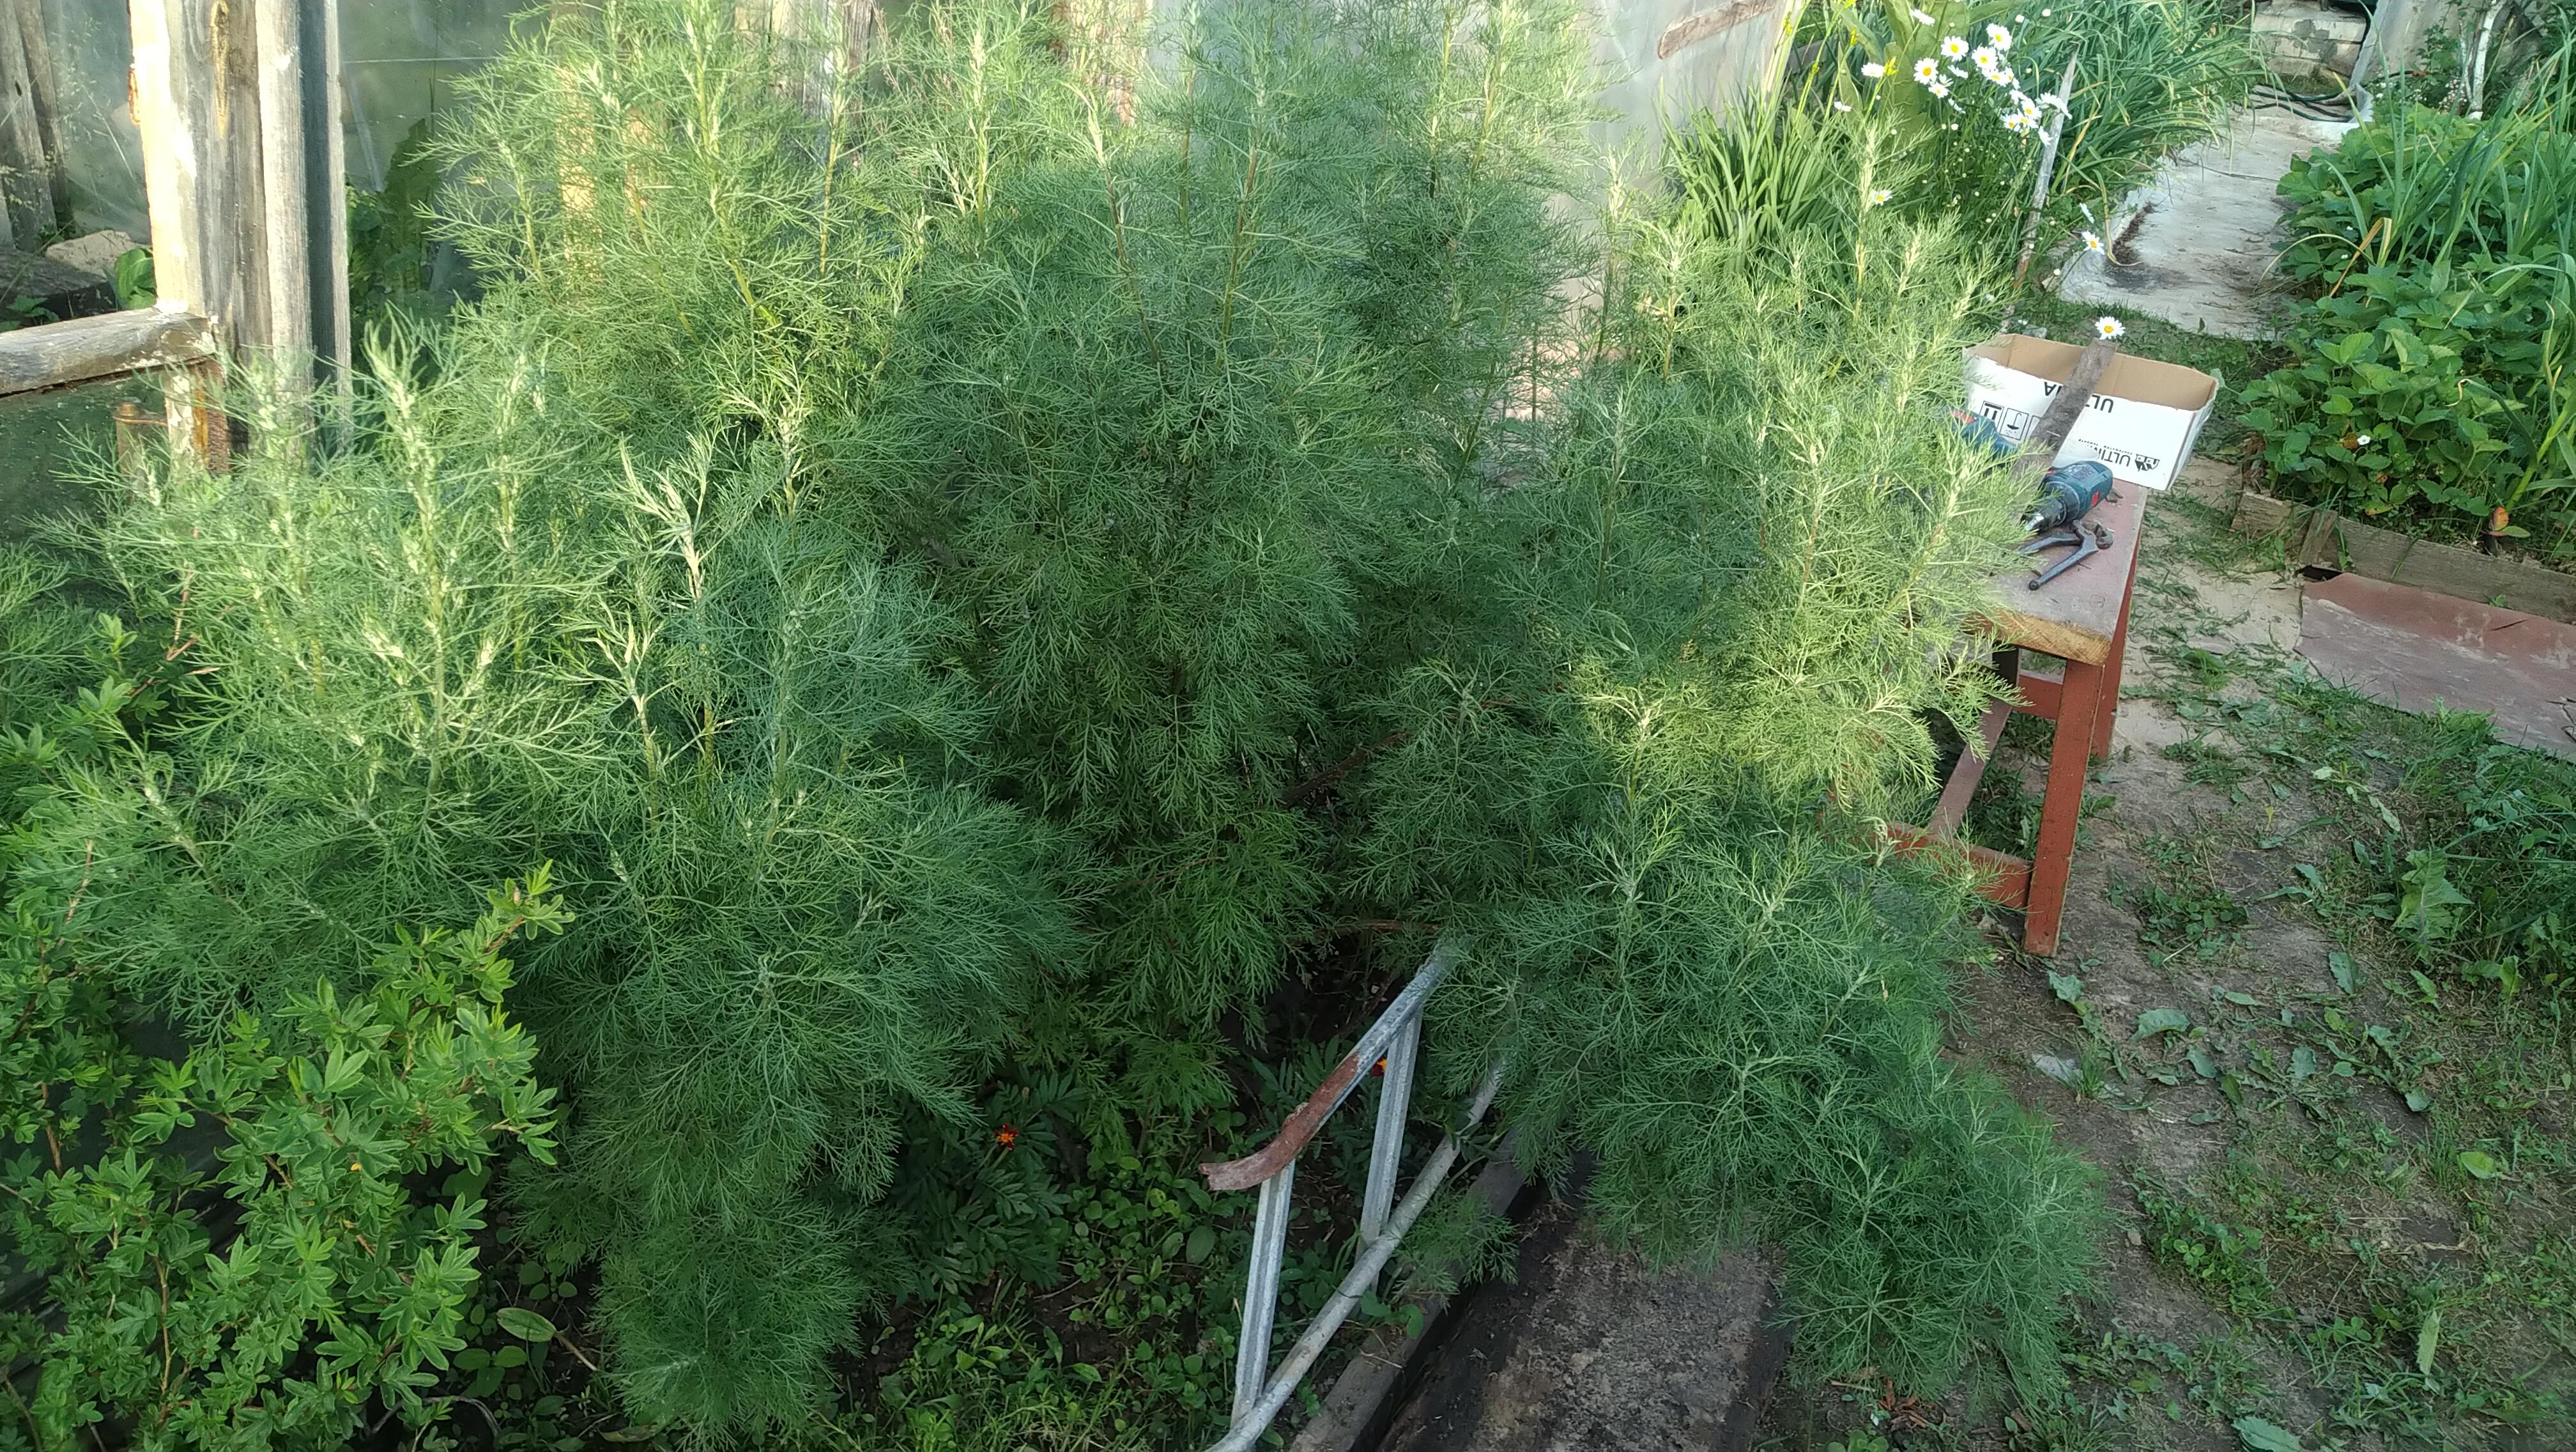 ᐉ писцидиевое дерево - полезные свойства, описание - roza-zanoza.ru